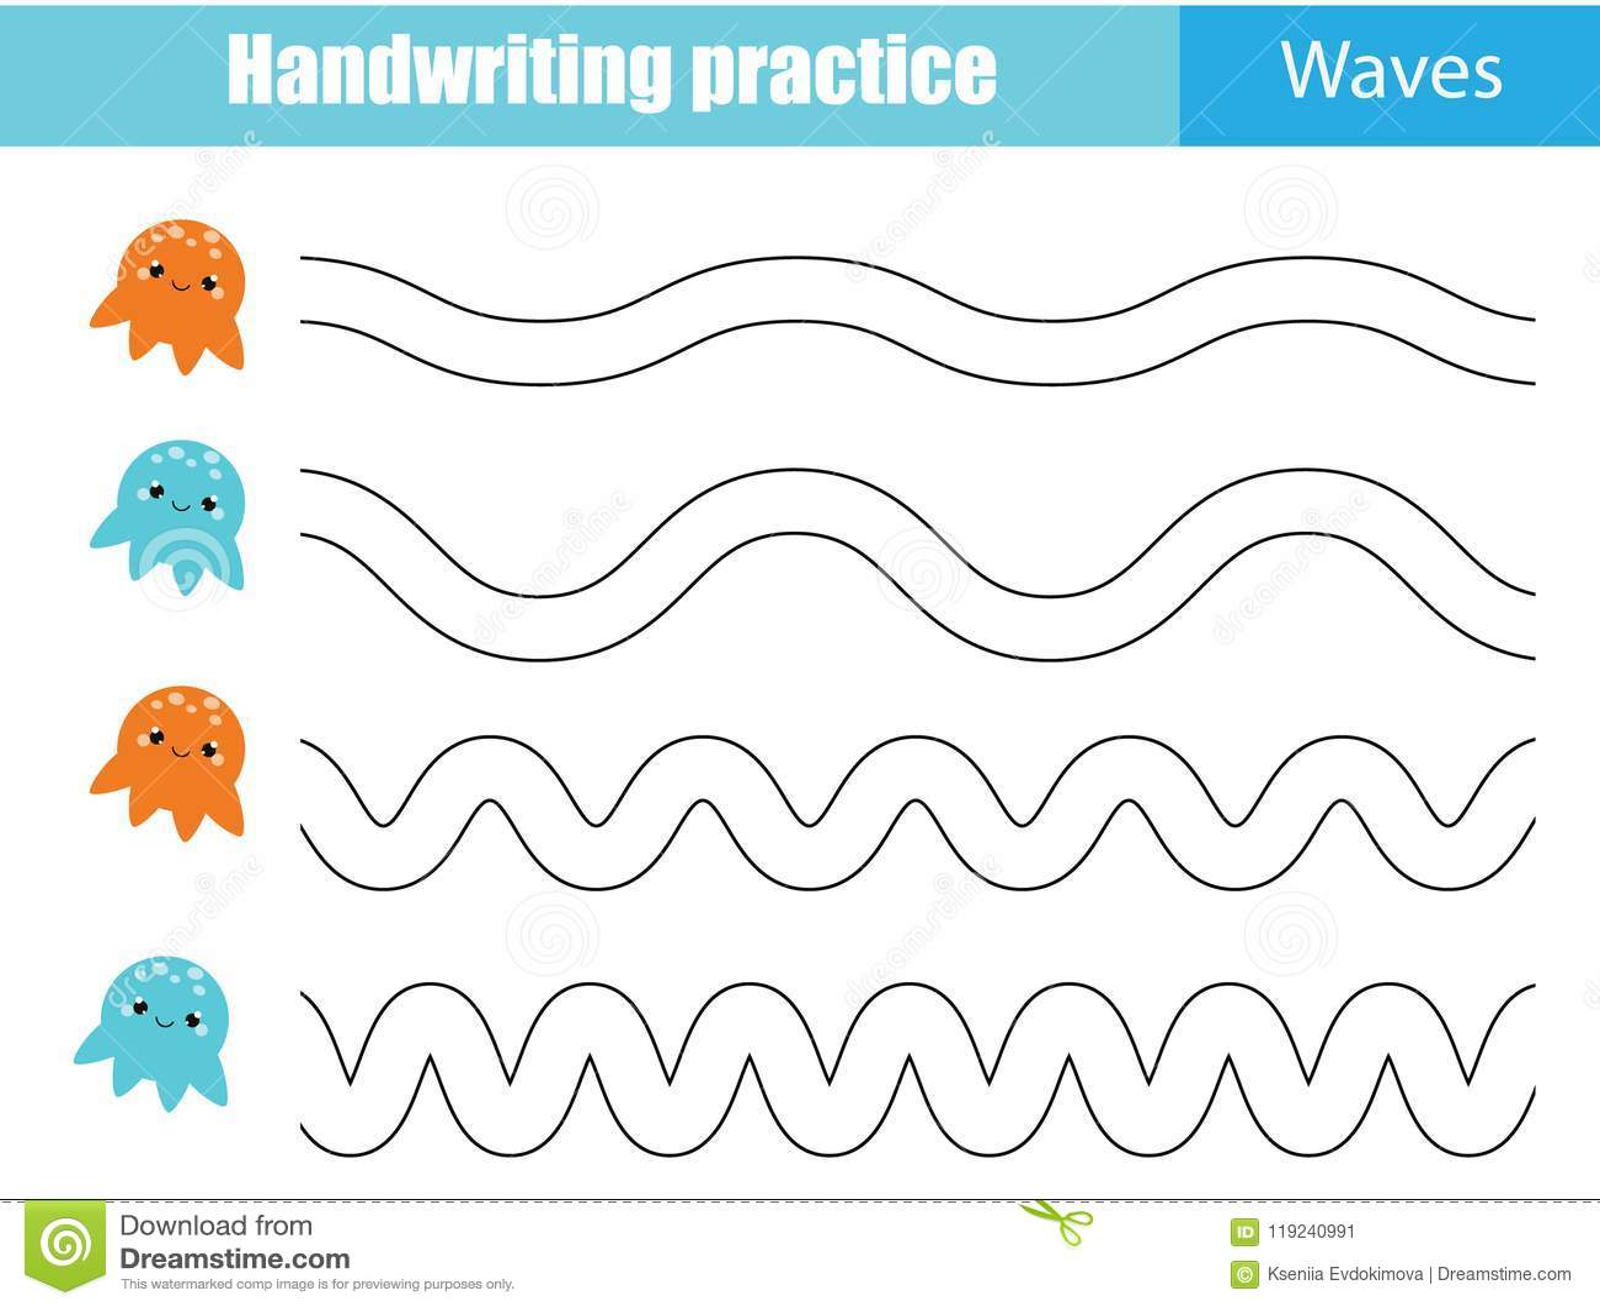 handwriting practice sheet. educational children game, printable